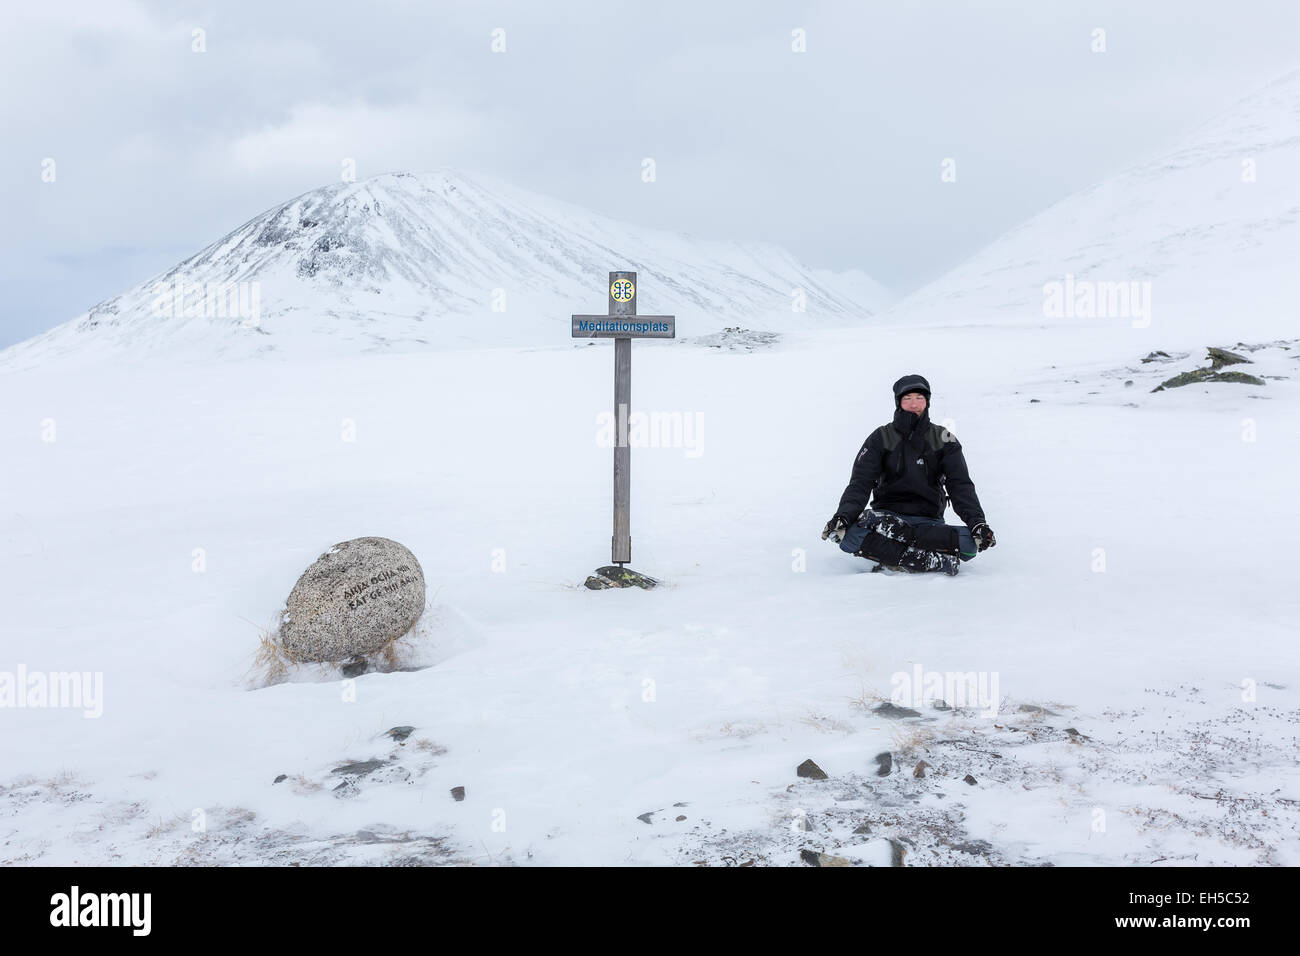 Meditation am Kungsleden Trail, Kebnekaise Mountain Bereich, Kiruna, Nordschweden, Europa, EU Stockbild